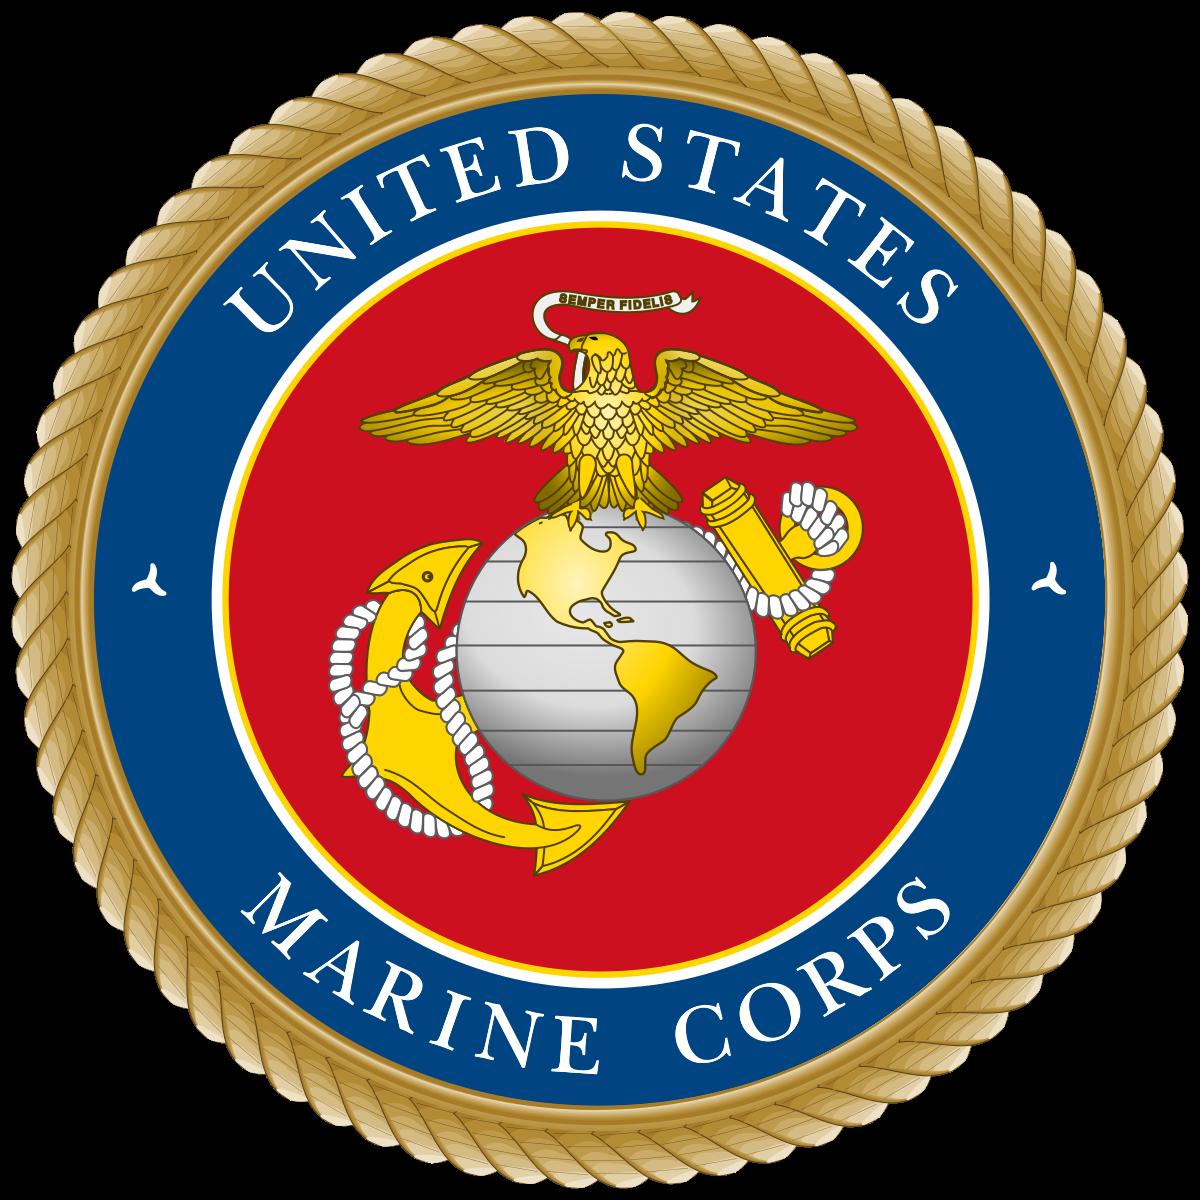 Marine Corp Birthday Marine corps, Staff sergeant, Us